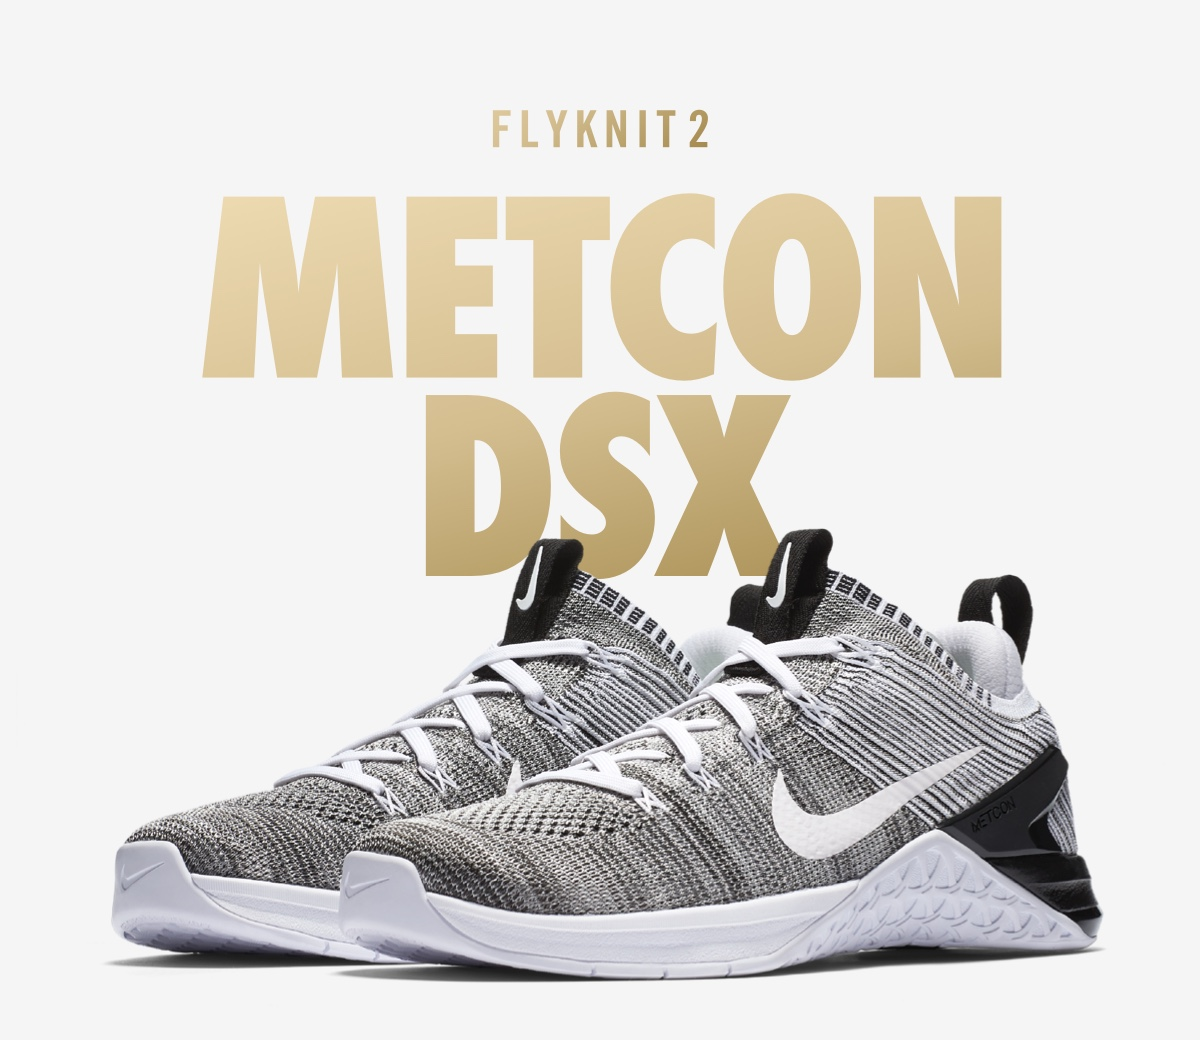 FLYKNIT 2 | METCON DSX